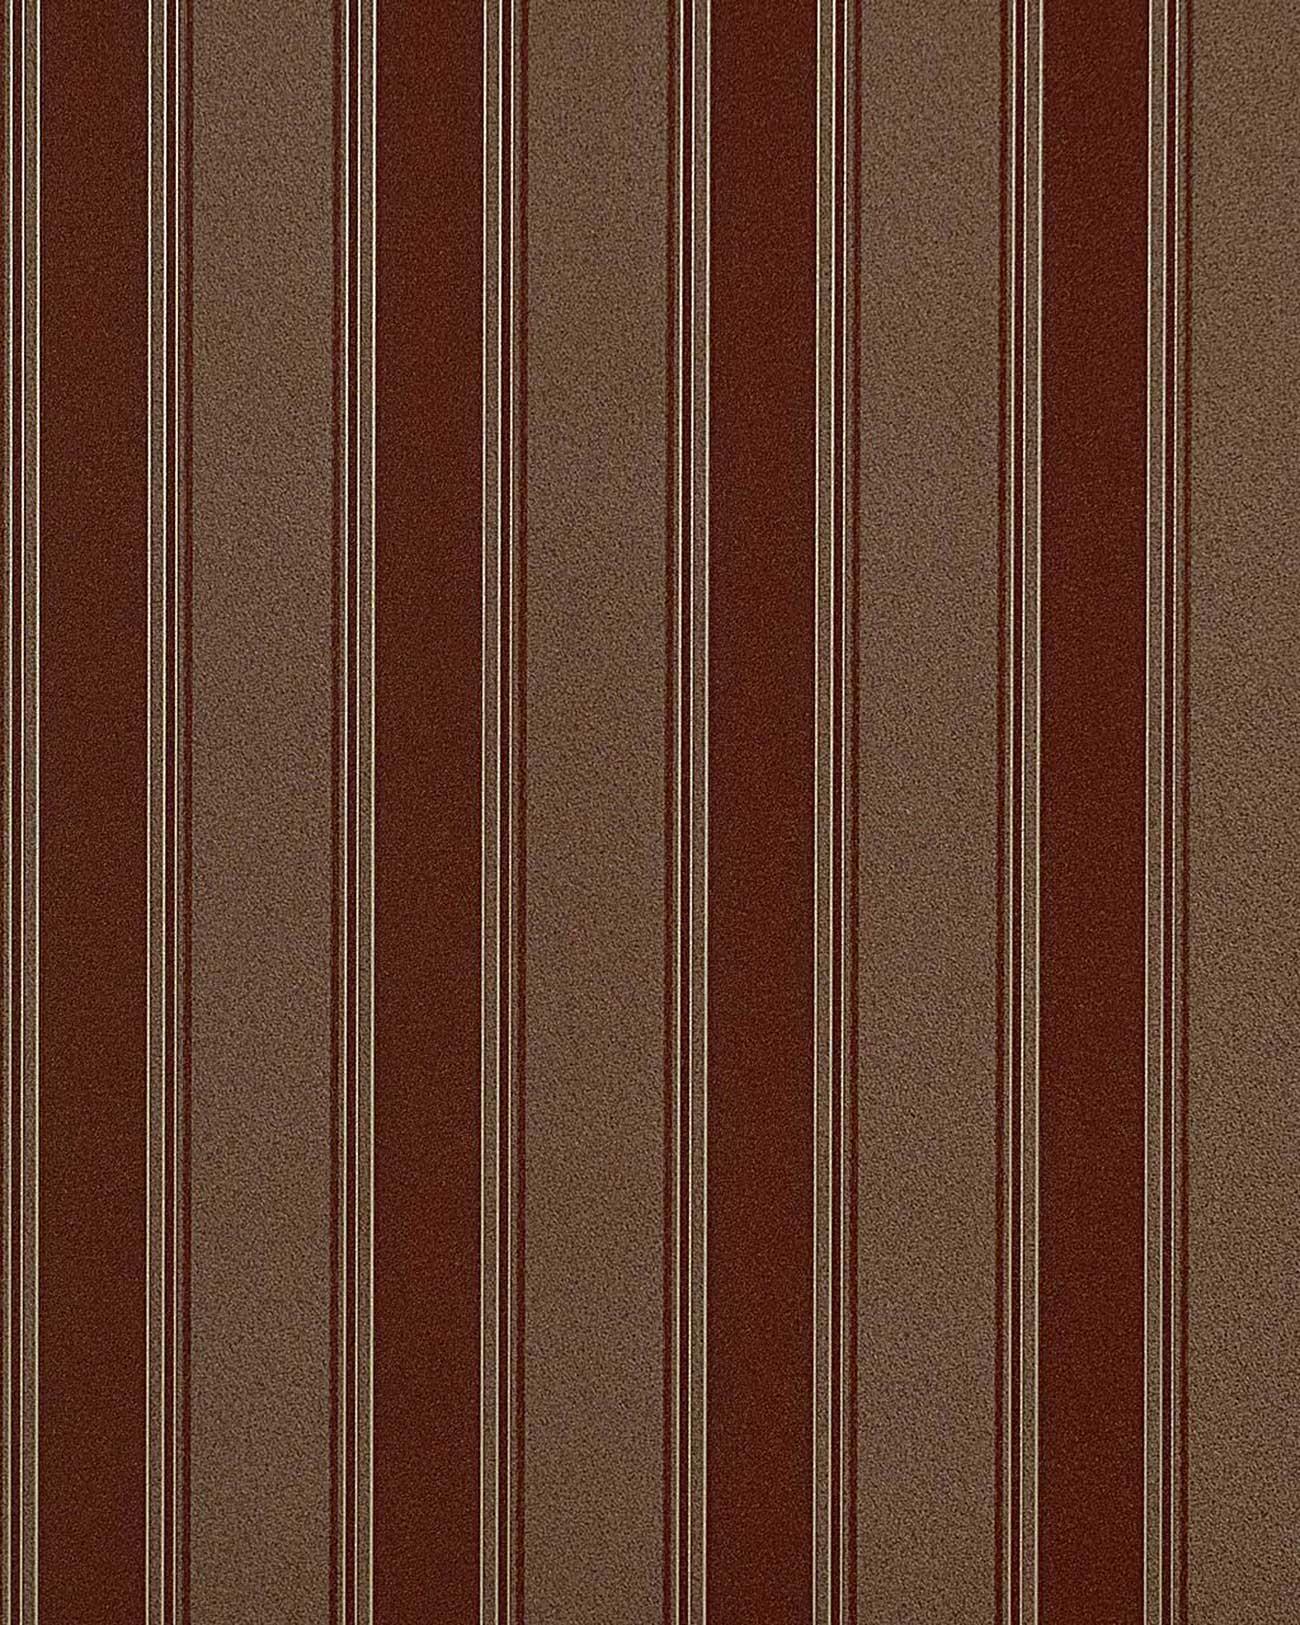 EDEM 827-26 tapete barock opulence streifen rot-braun kakao-braun ...